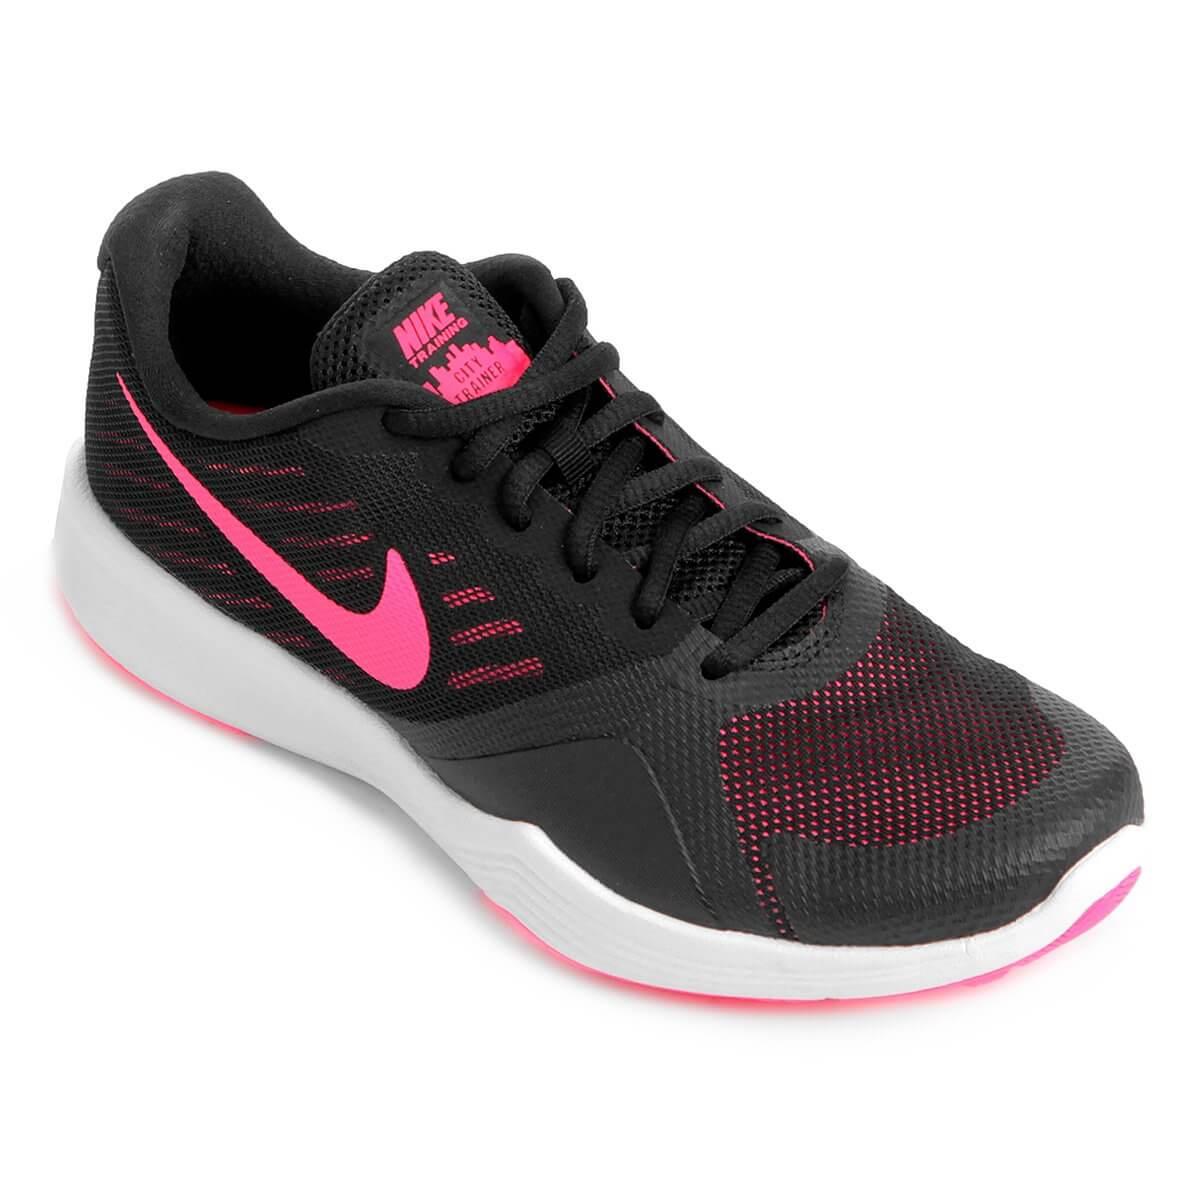 554d0fb761d12 Tênis Nike City Trainer Feminino - Decker Online!